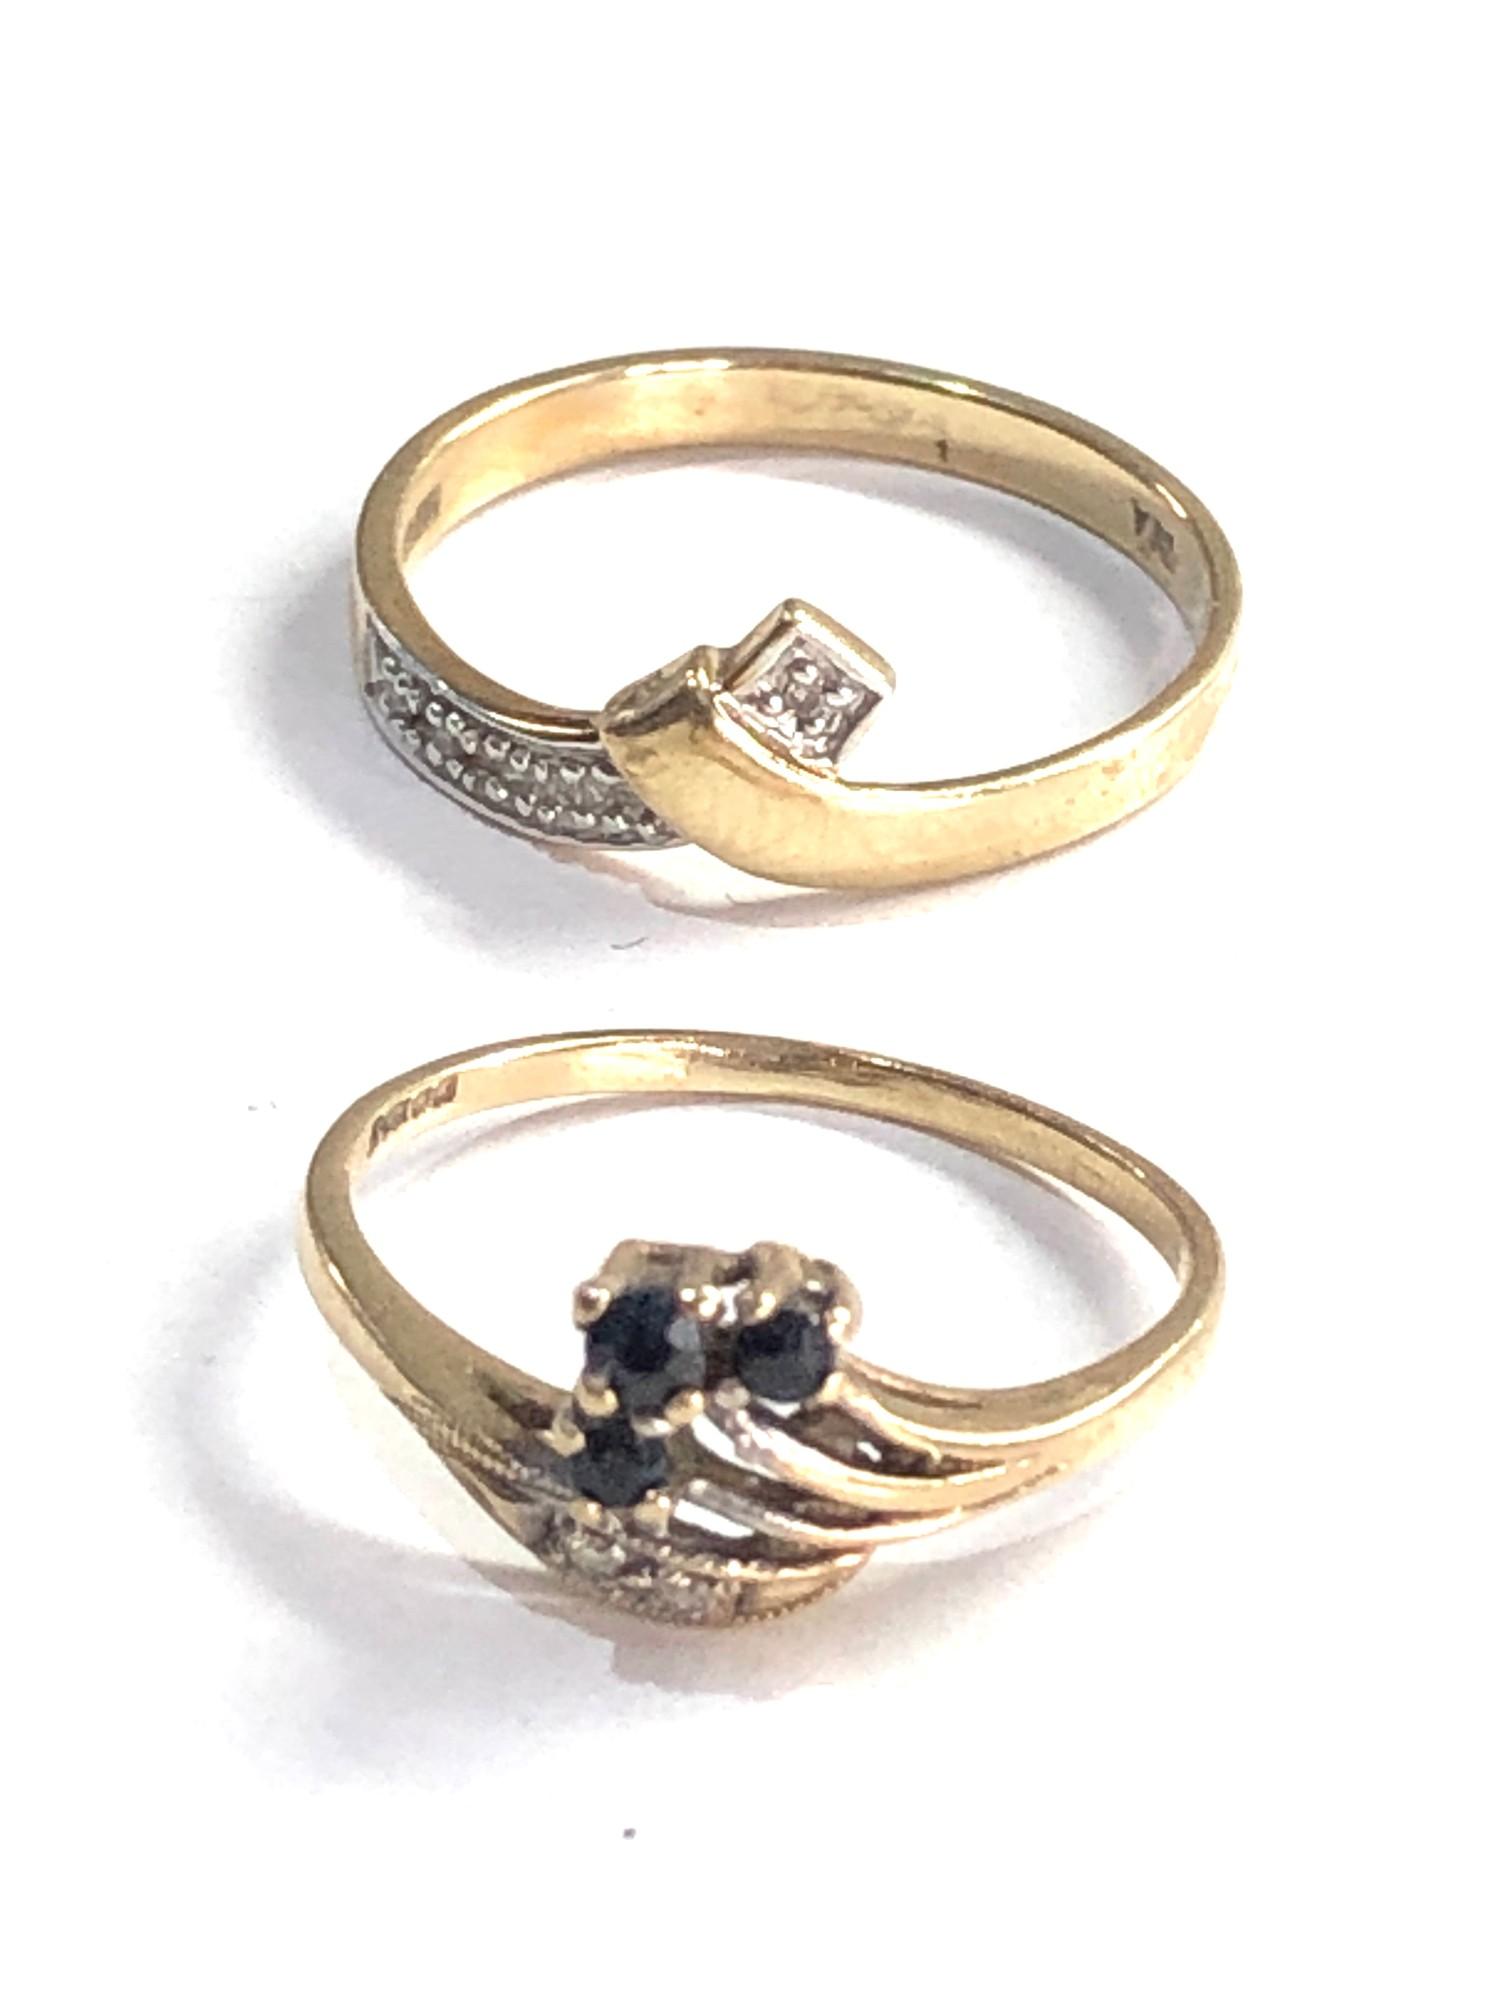 2 x 9ct gold diamond detail rings inc. sapphire 2.5g - Image 2 of 3